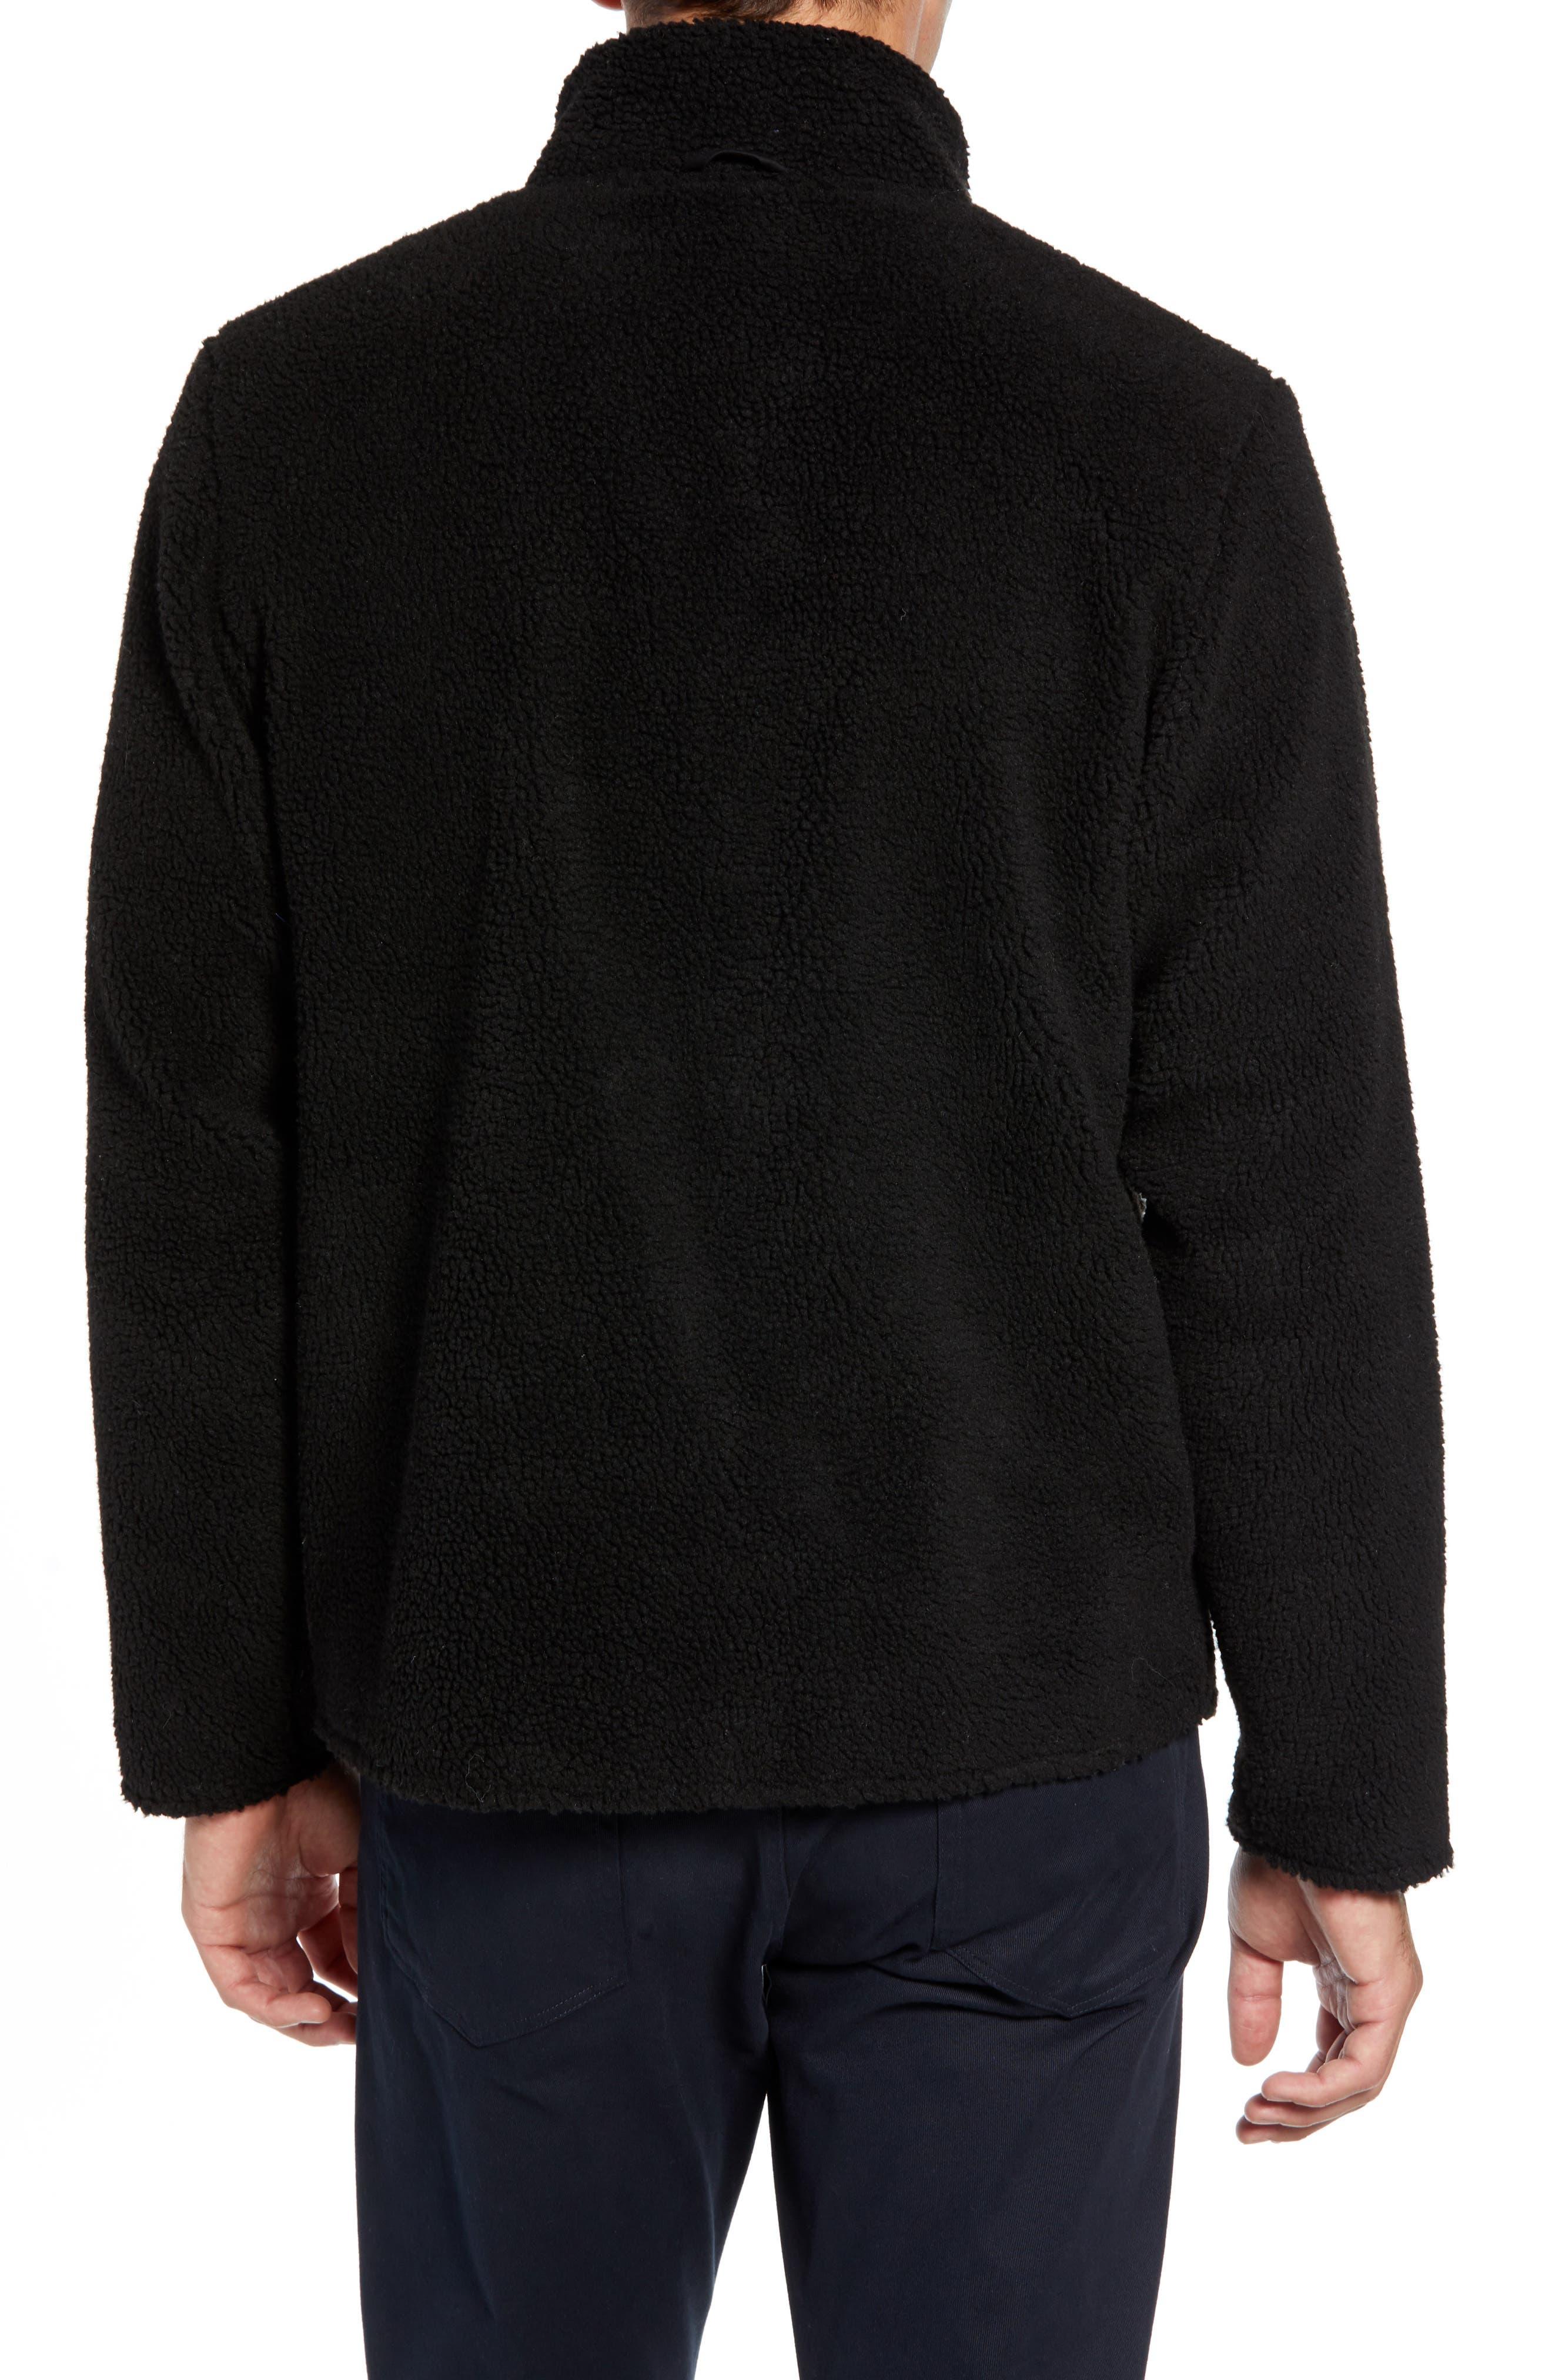 Varby Reversible Fleece Jacket,                             Alternate thumbnail 3, color,                             BLACK